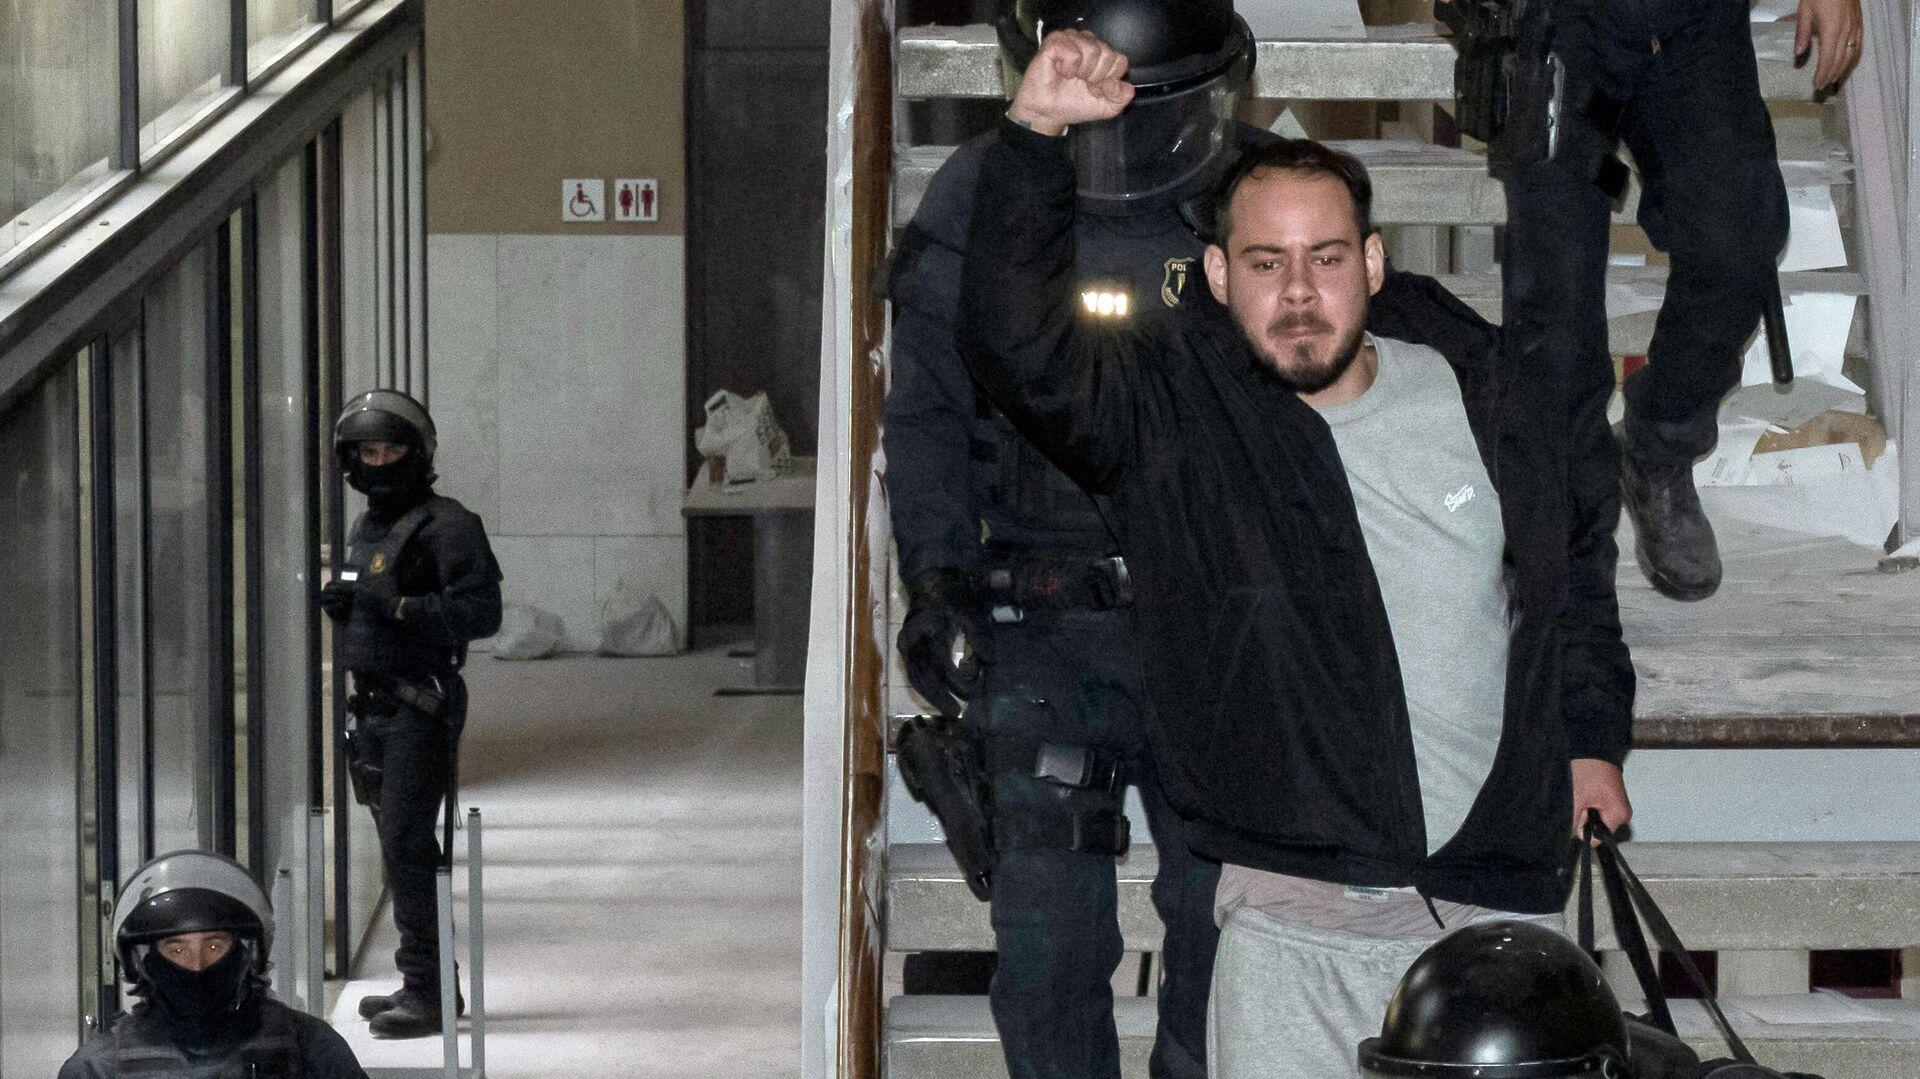 Rapero catalán, Pablo Hasél, tras ser detenido en la Universidad de Lleida - Sputnik Mundo, 1920, 16.02.2021